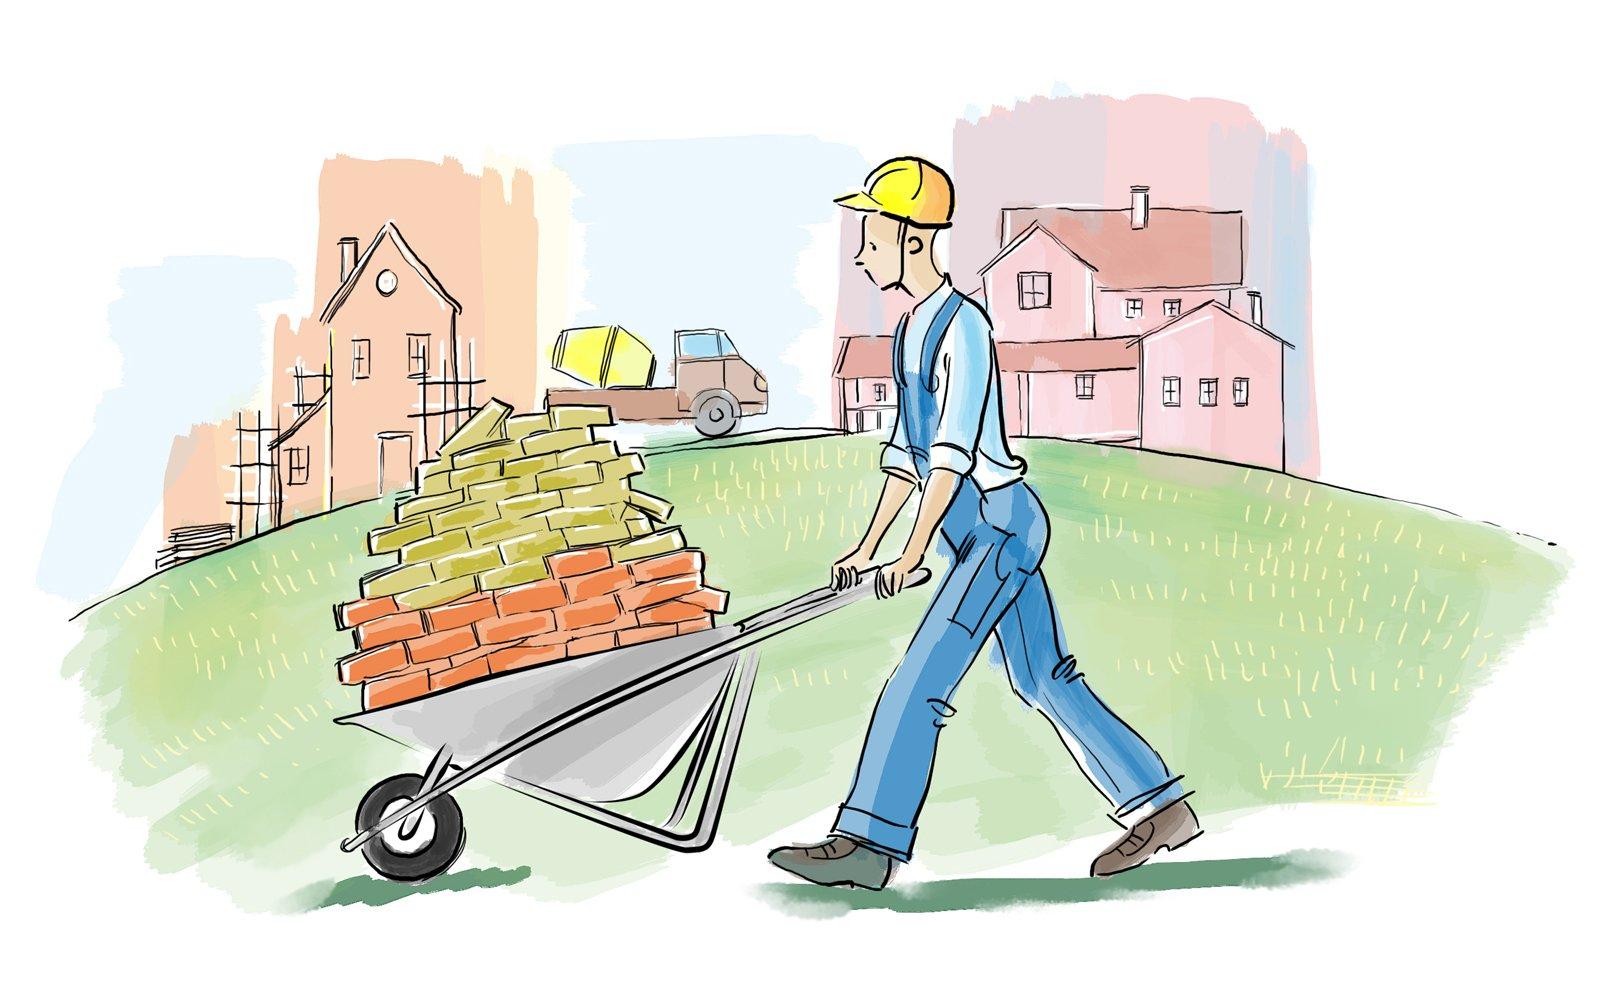 Incentivi fiscali cose di casa - Lavori in casa detrazioni ...